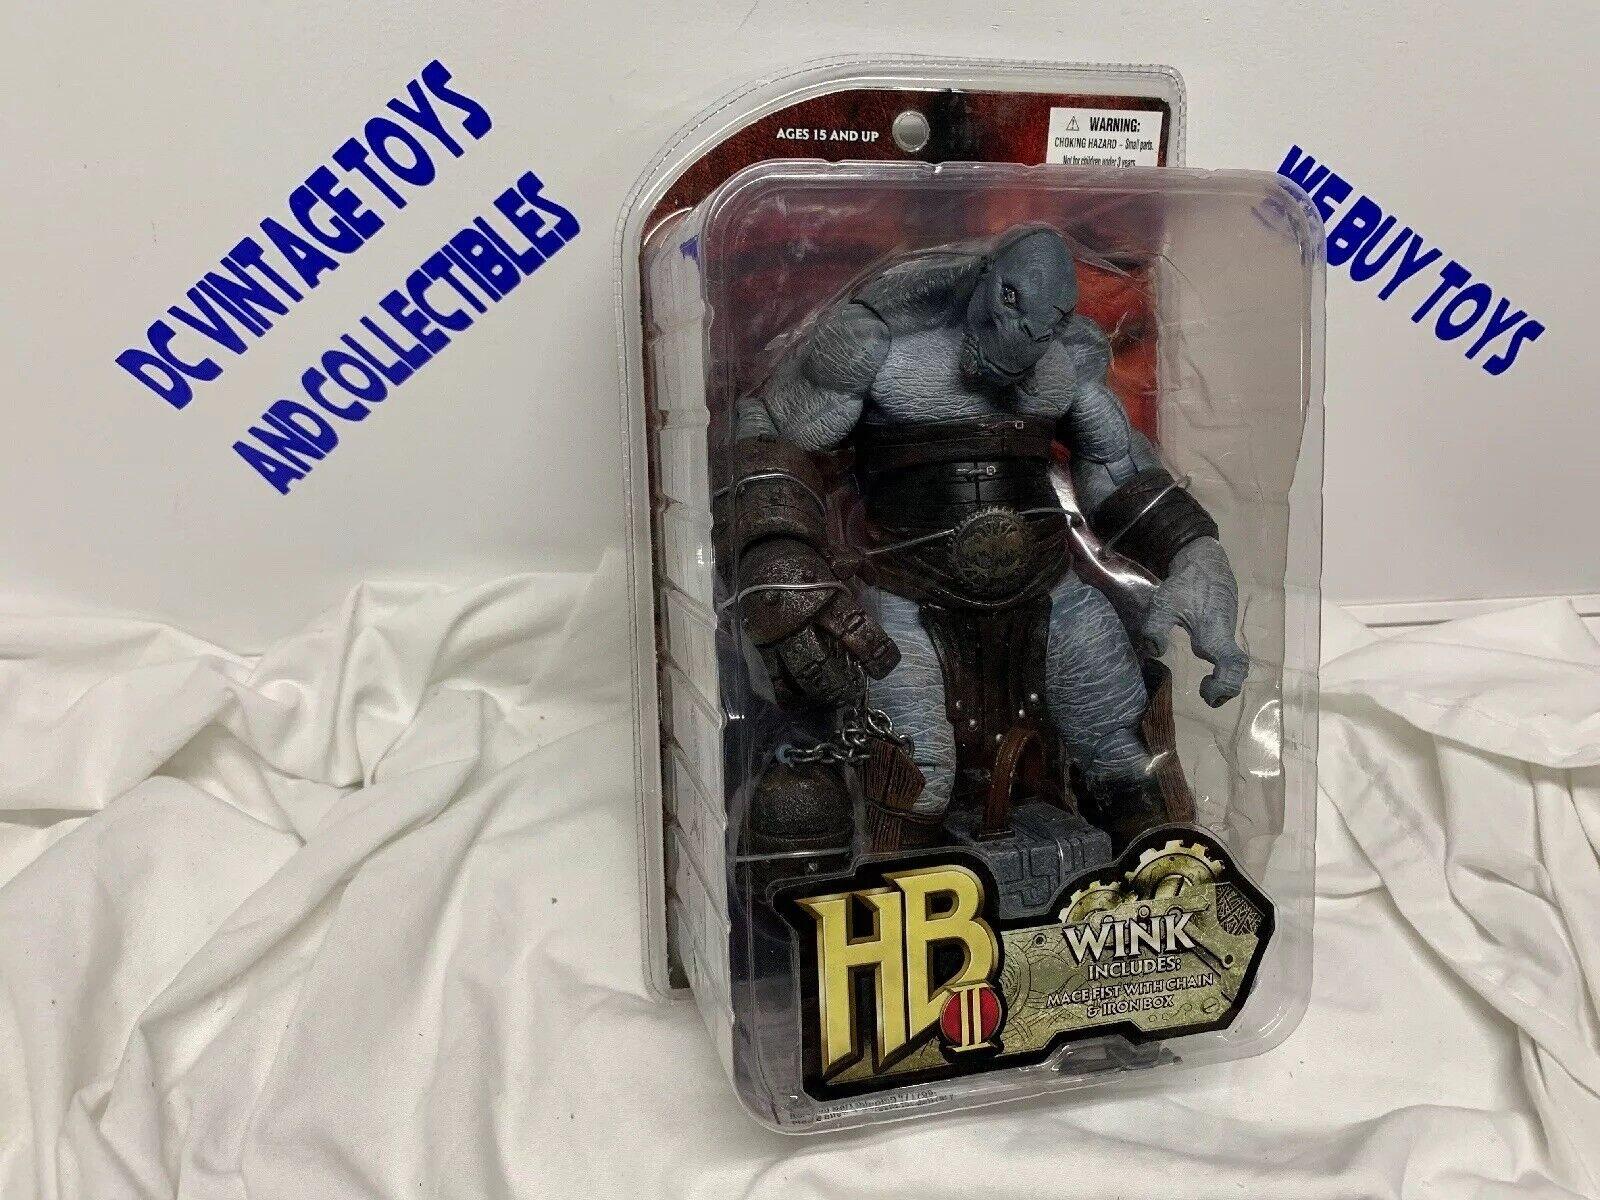 Hellboy II 2 The oroen Army Series 1 WINK 9 azione cifra Mezco 2008 BRe nuovo